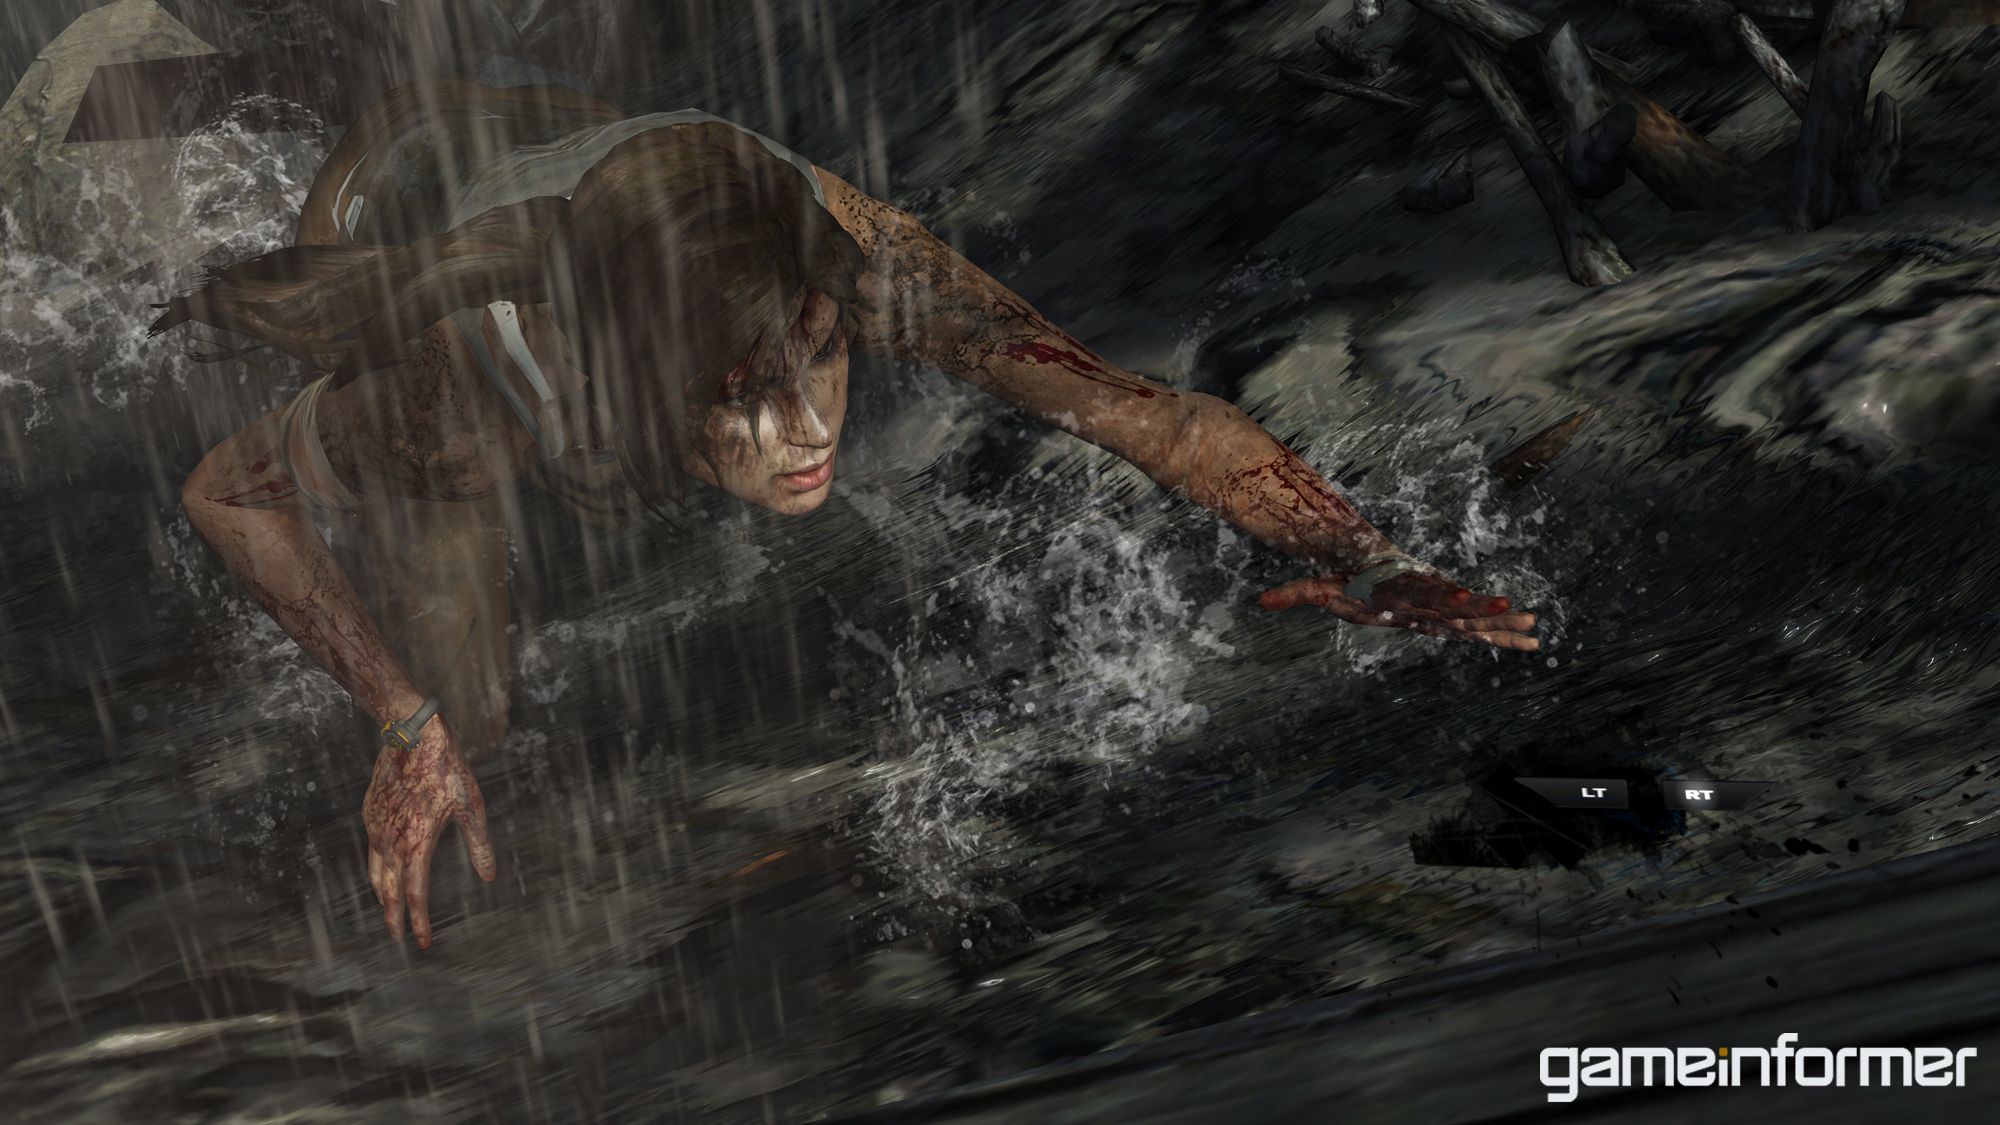 Lara Croft New tomb raider, Tomb raider game, Tomb